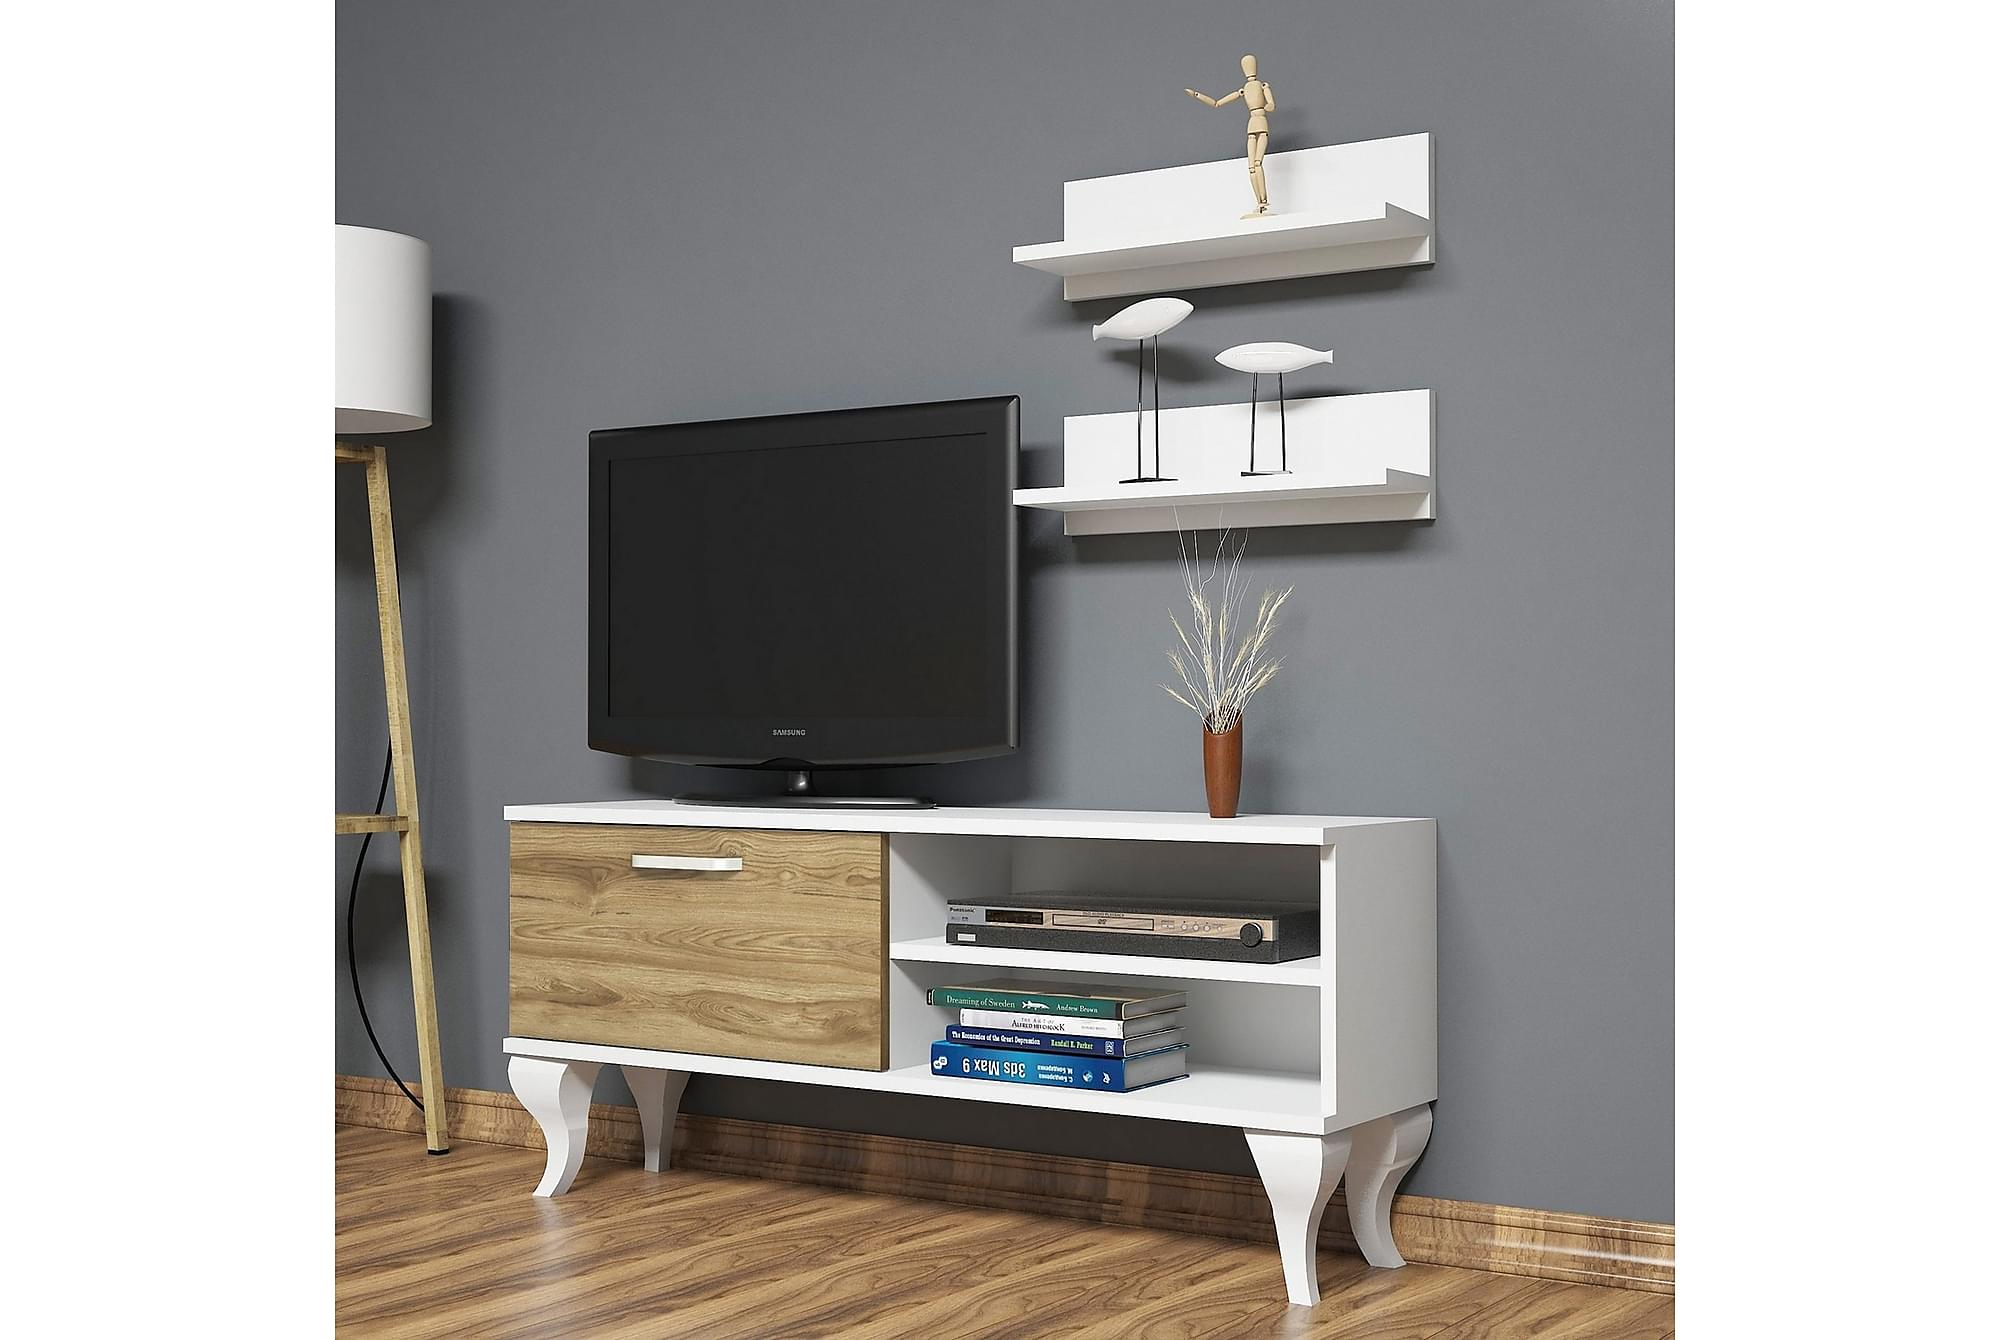 ANEESIA TV-Möbelset 120 cm Vit/Valnöt, Tv-möbelset